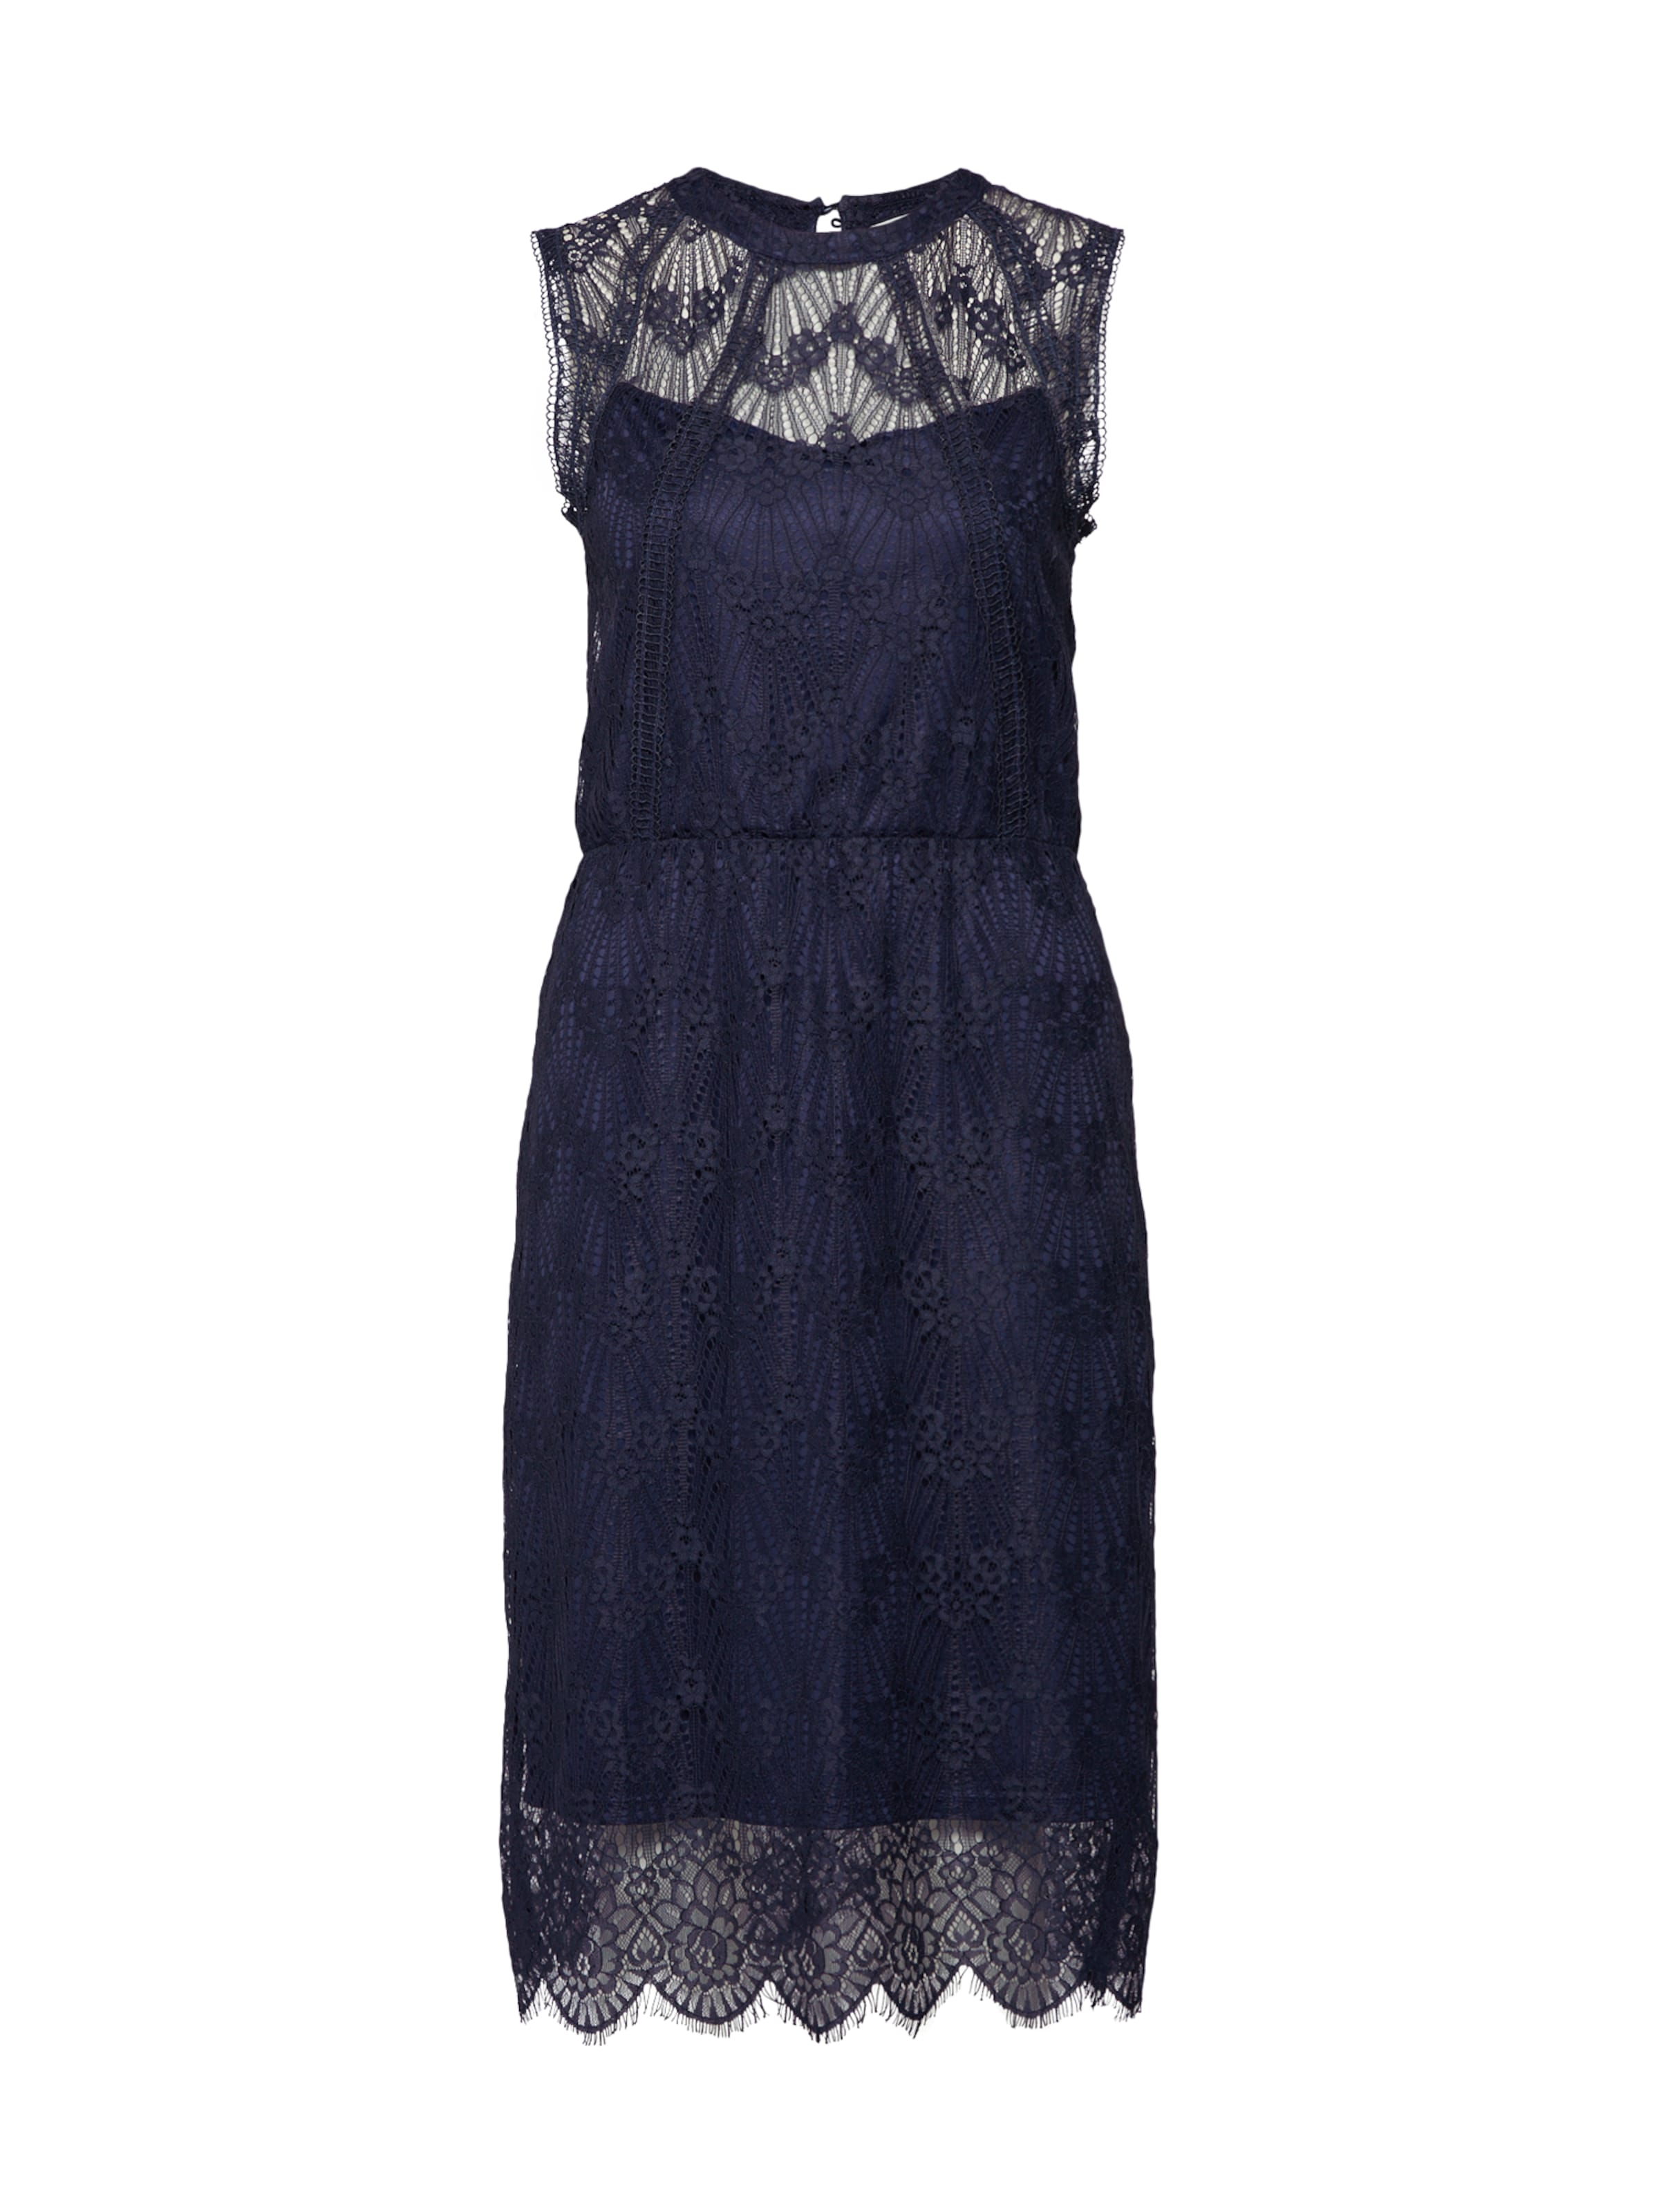 'vicalora' Bleu Vila Robe Cocktail En Marine De UVjLqzpSGM